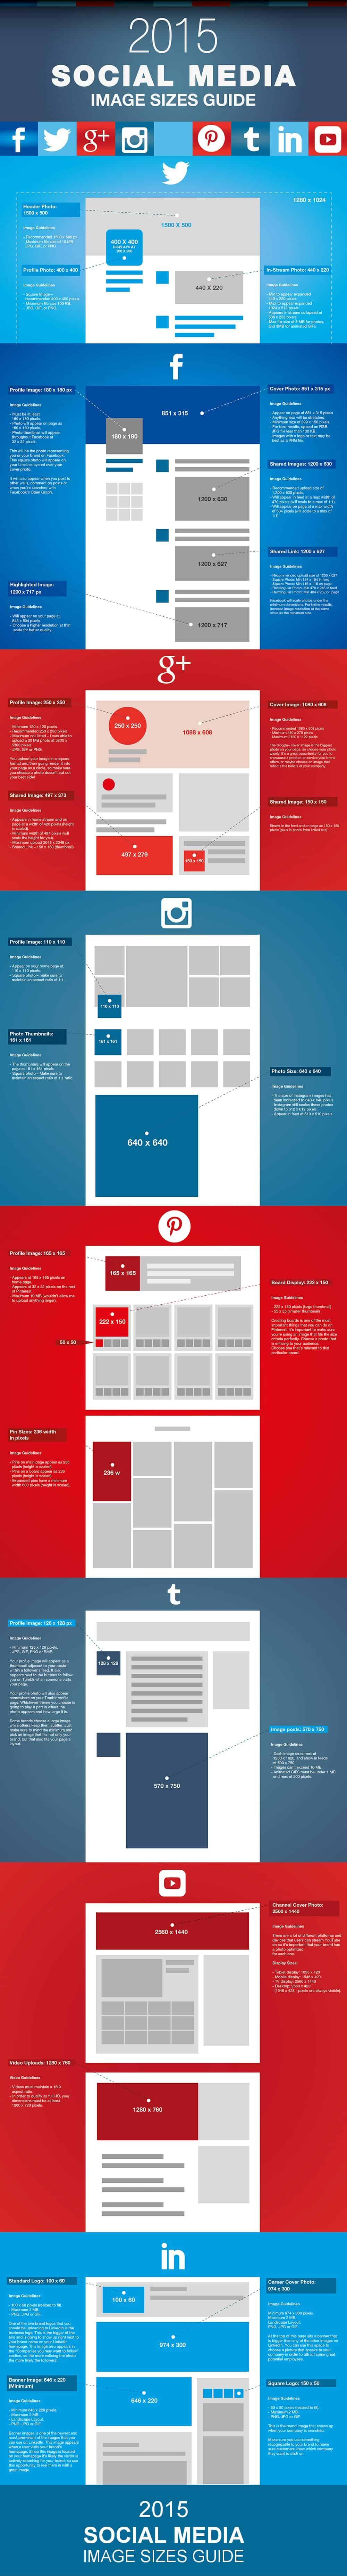 2015 Social Media Guide